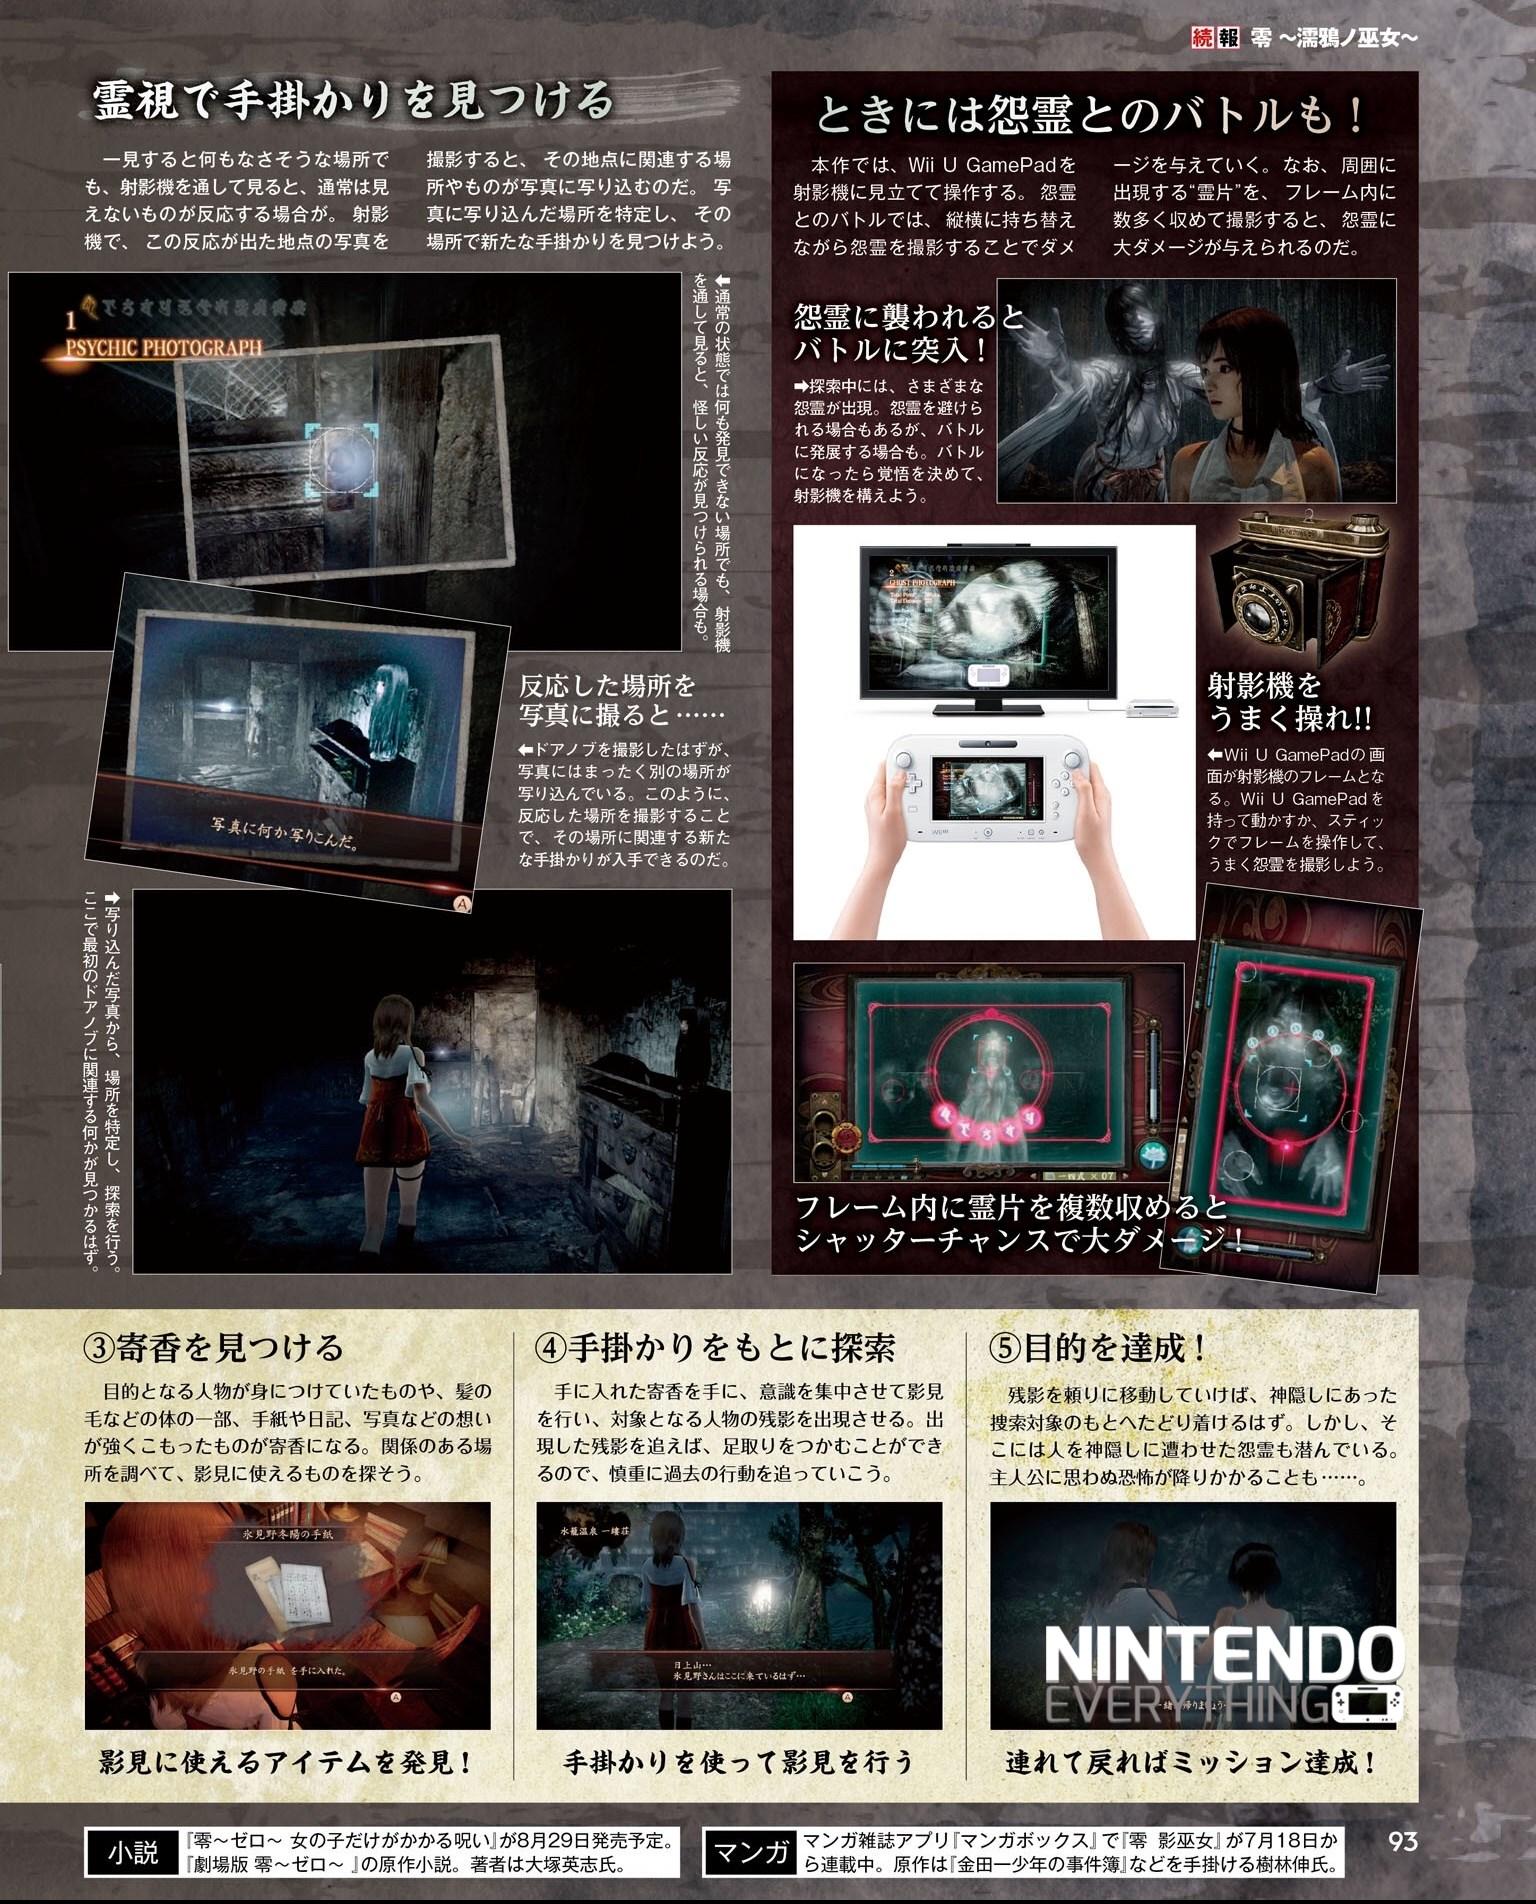 Fatal Frame: The Black Haired Shrine Maiden scans - Nintendo Everything